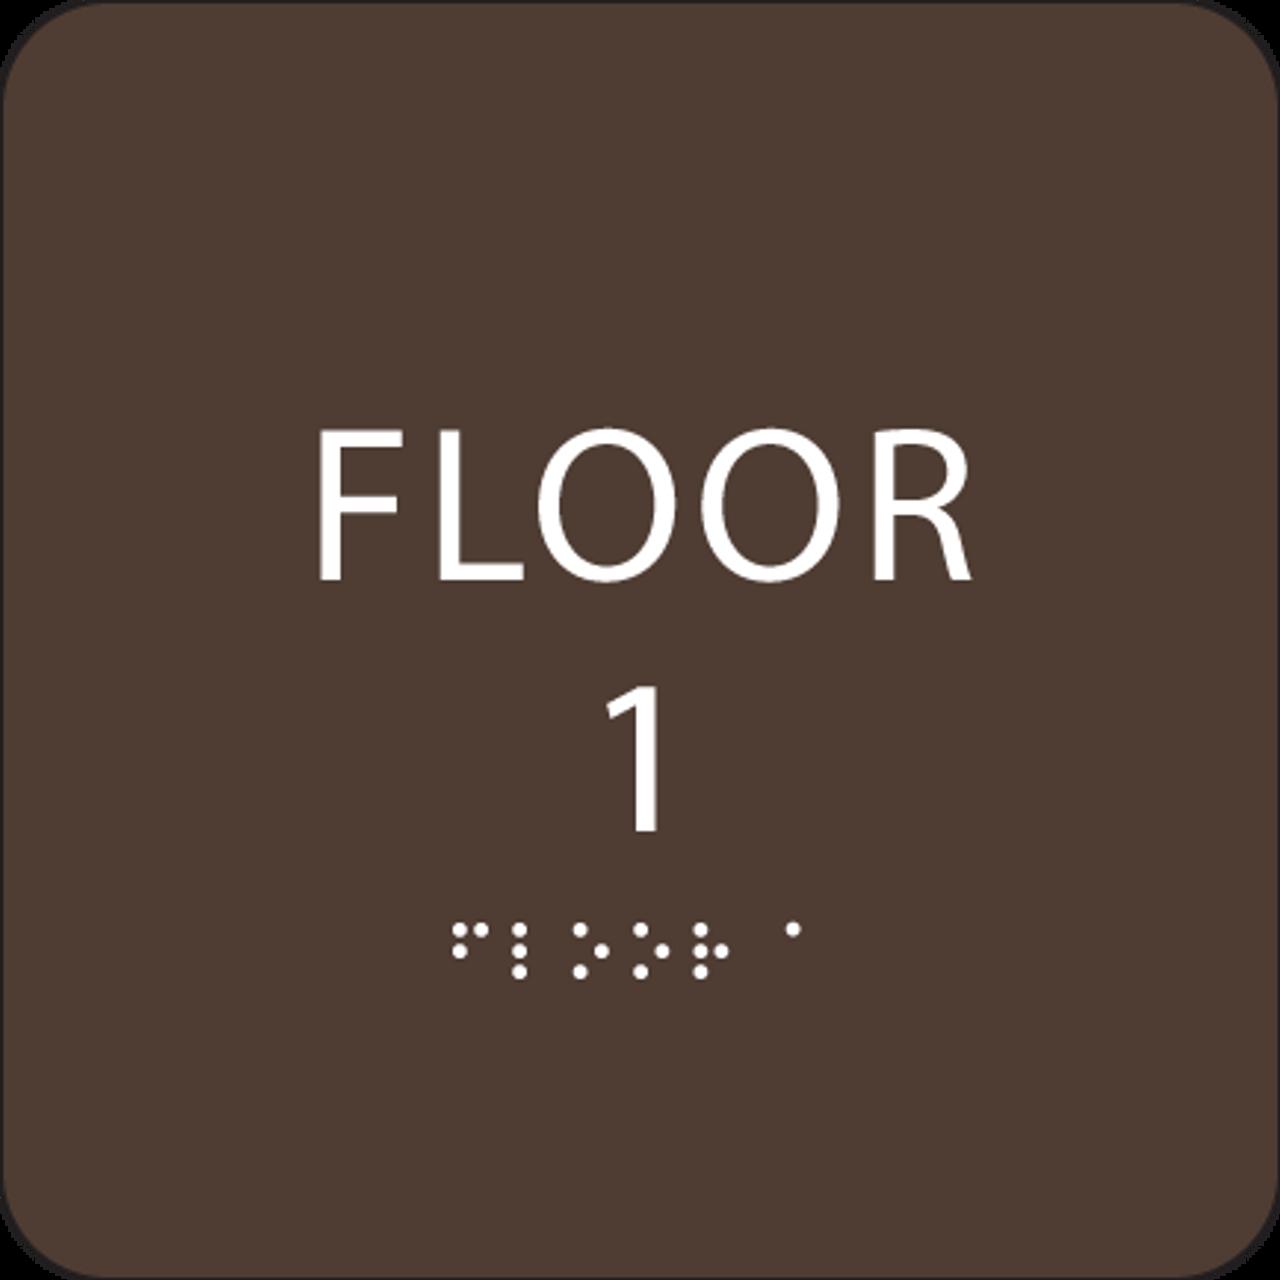 Dark Brown Floor 1 Identification Sign